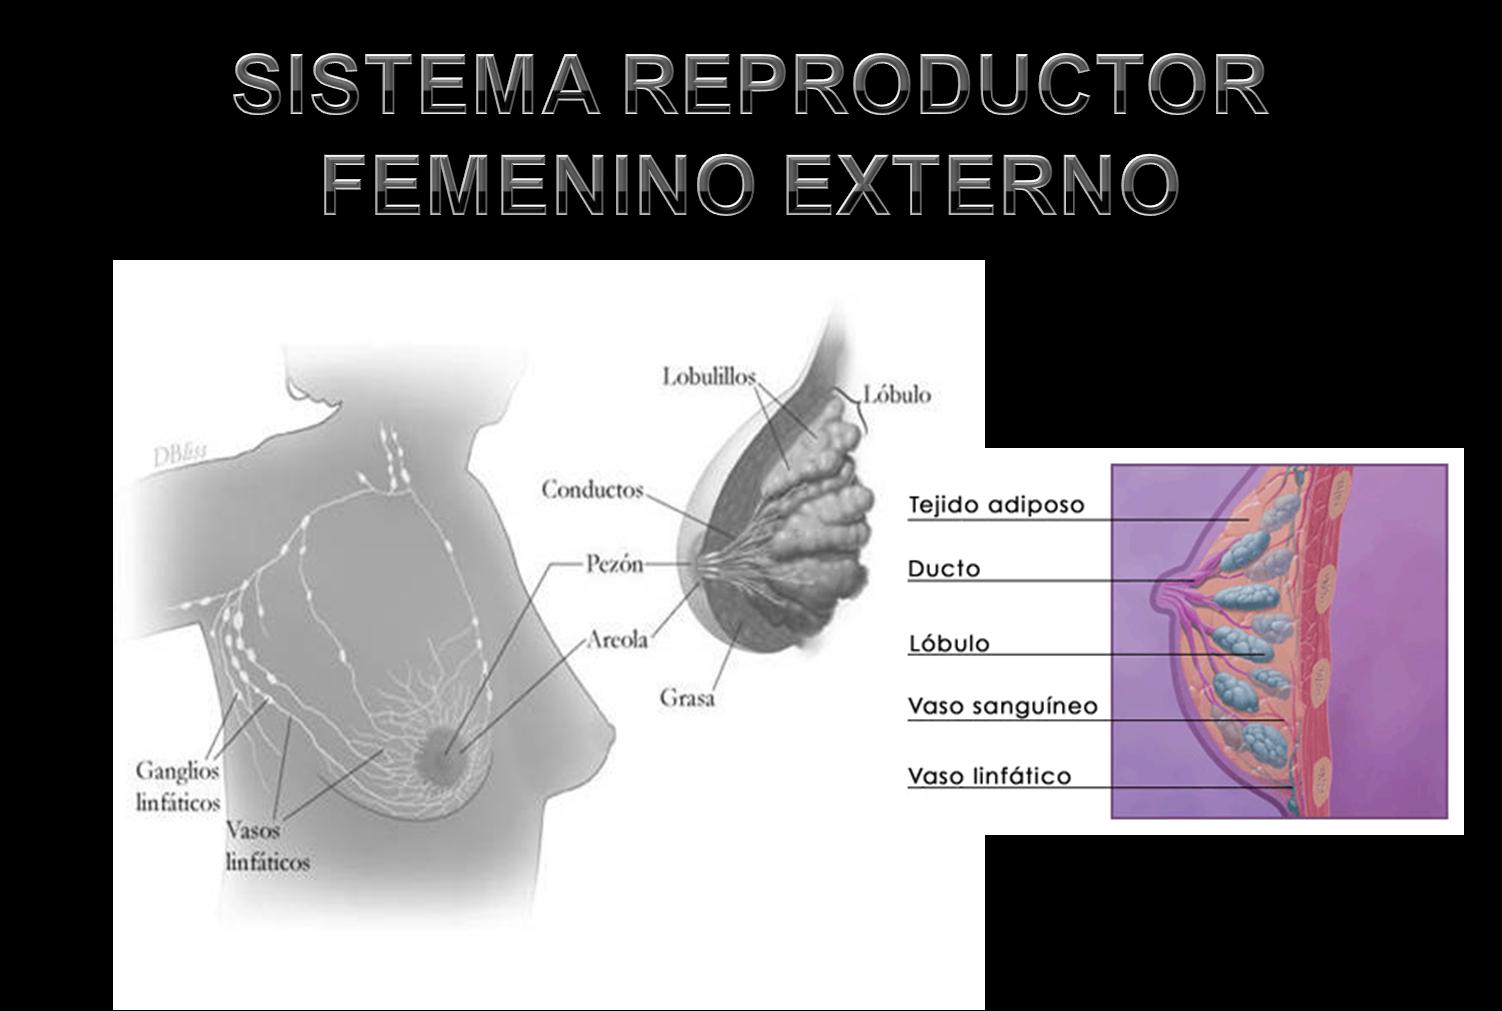 Sistema reproductor masculino y femenino sistema for Interno s